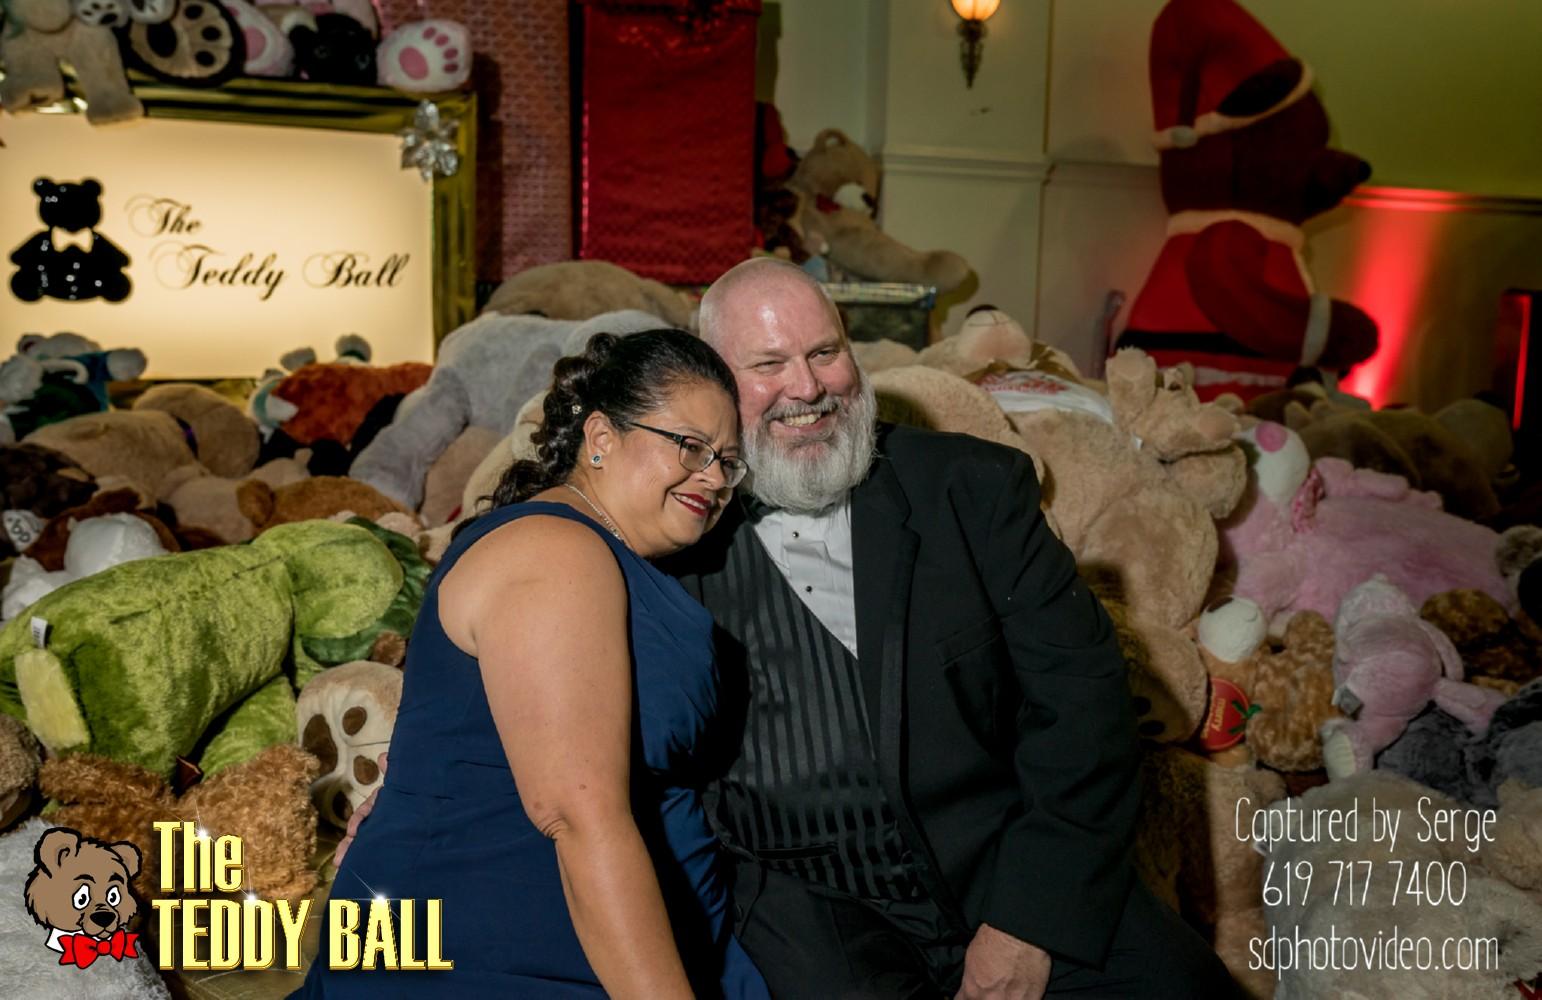 Teddy-Ball-2017-SD-Photo-Video-154.jpg